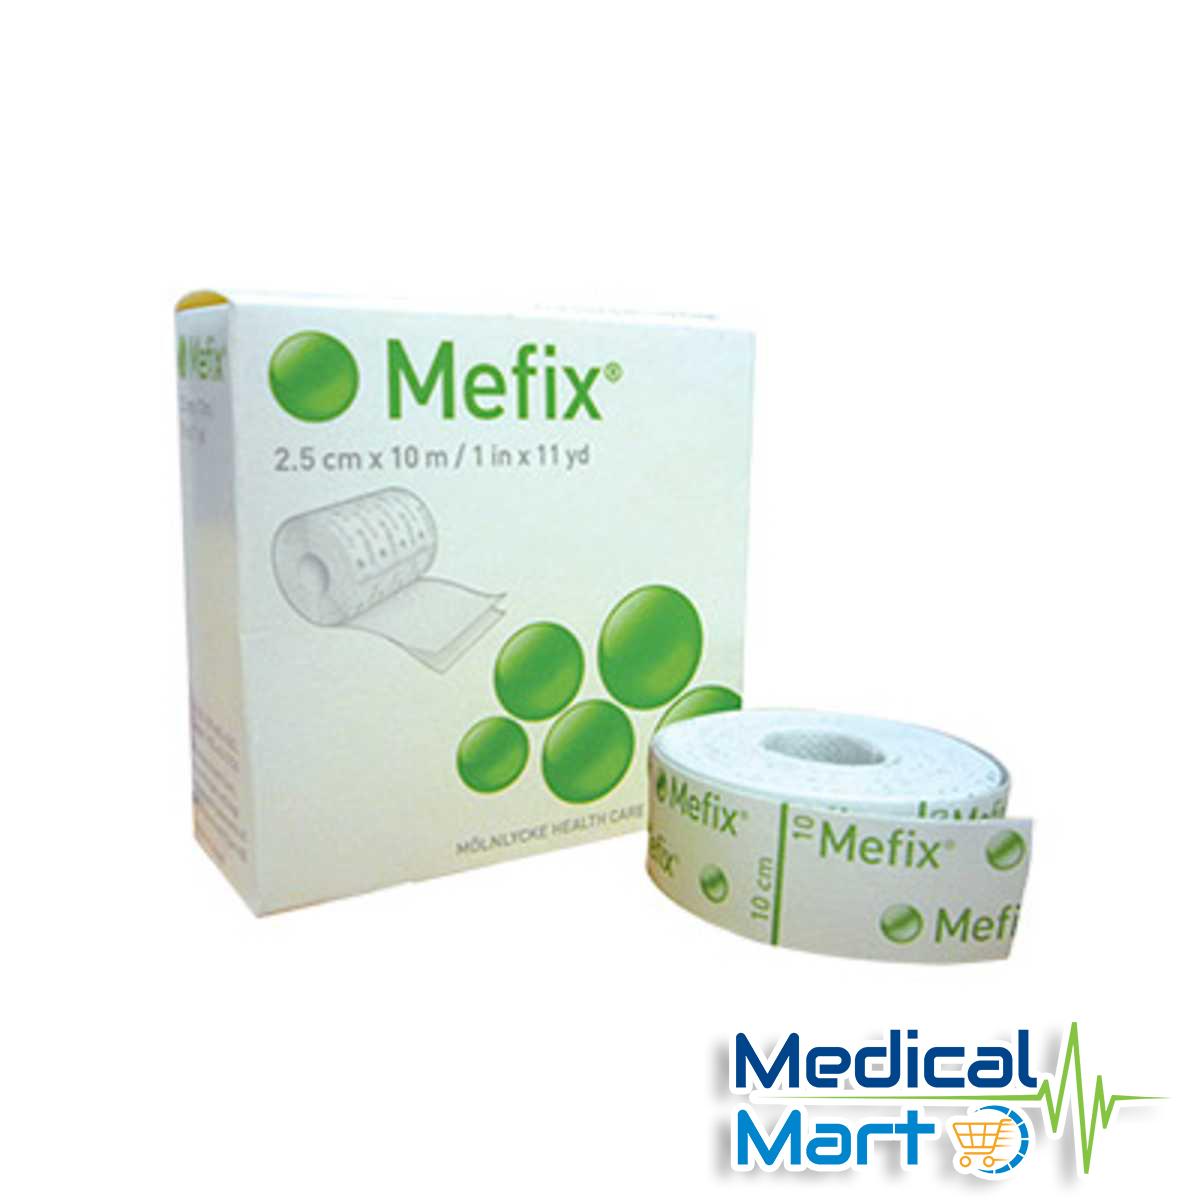 Mefix 2.5cm x 10m